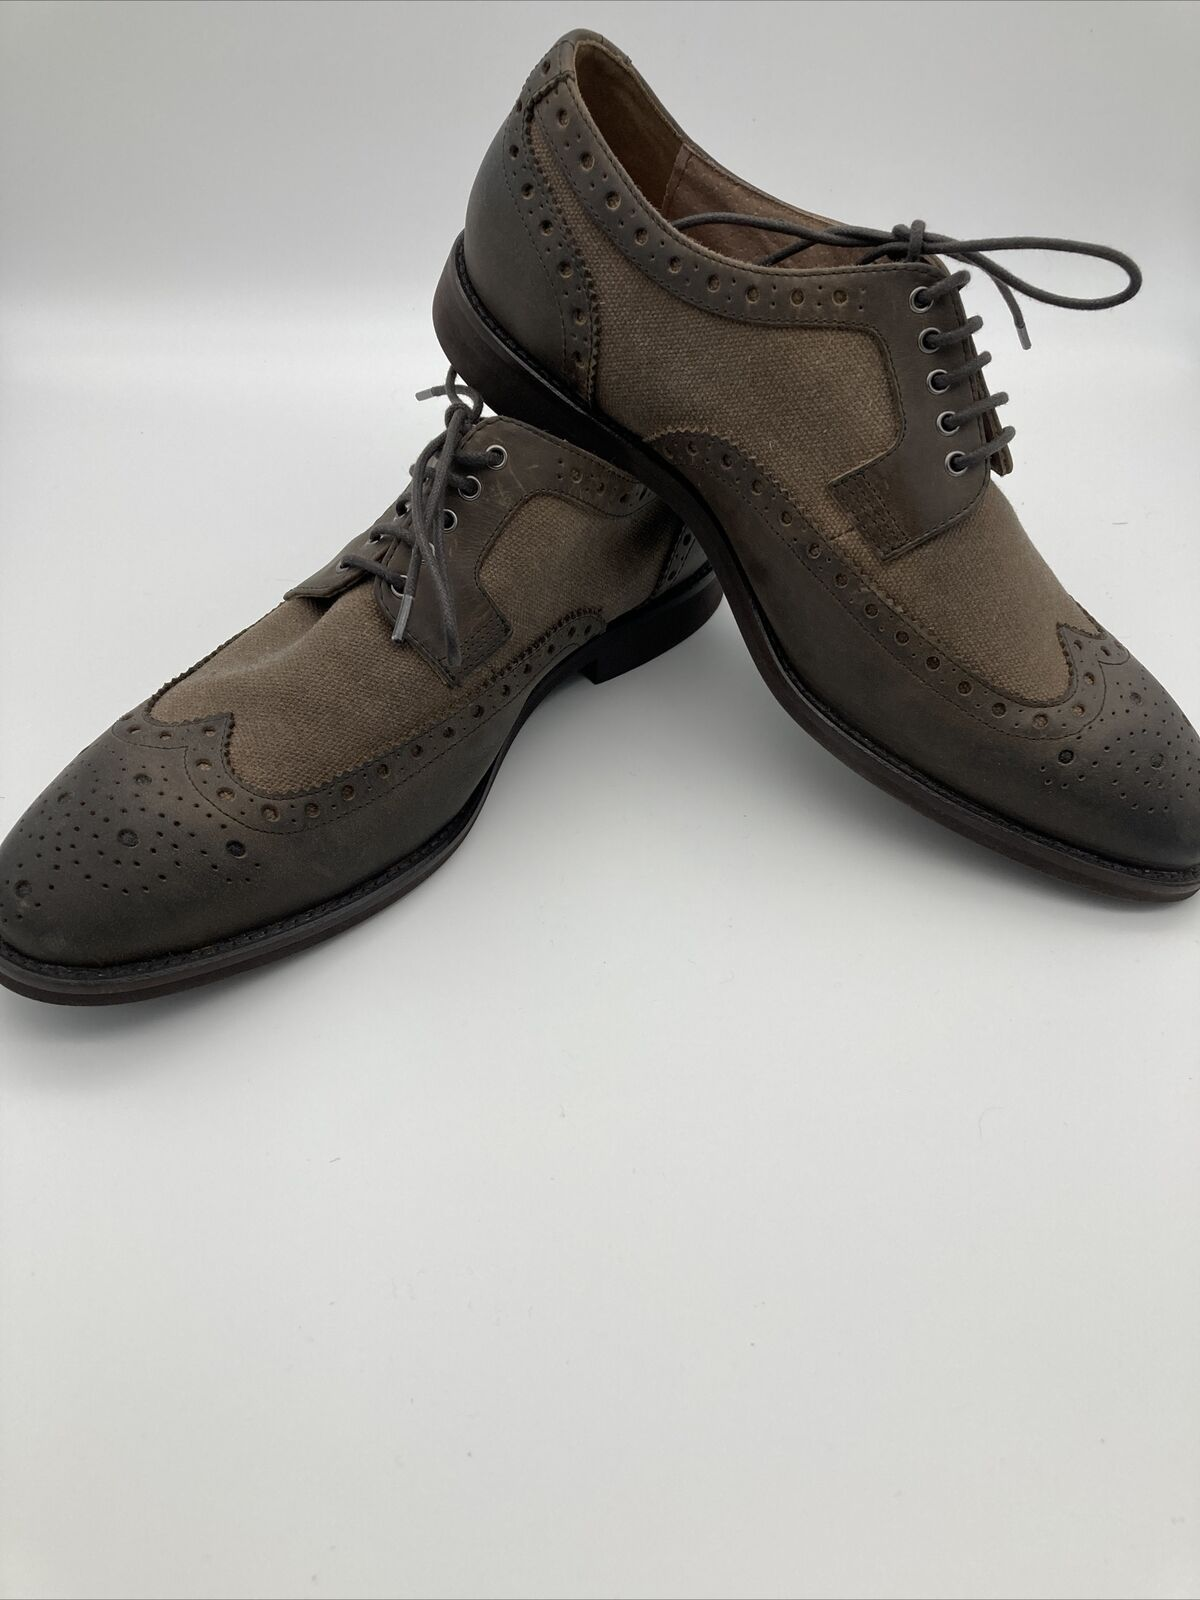 Joseph Abboud Wingtip Saddle Brown Two-tone Oxford Dress Shoes 40g4r00012 Sz 10